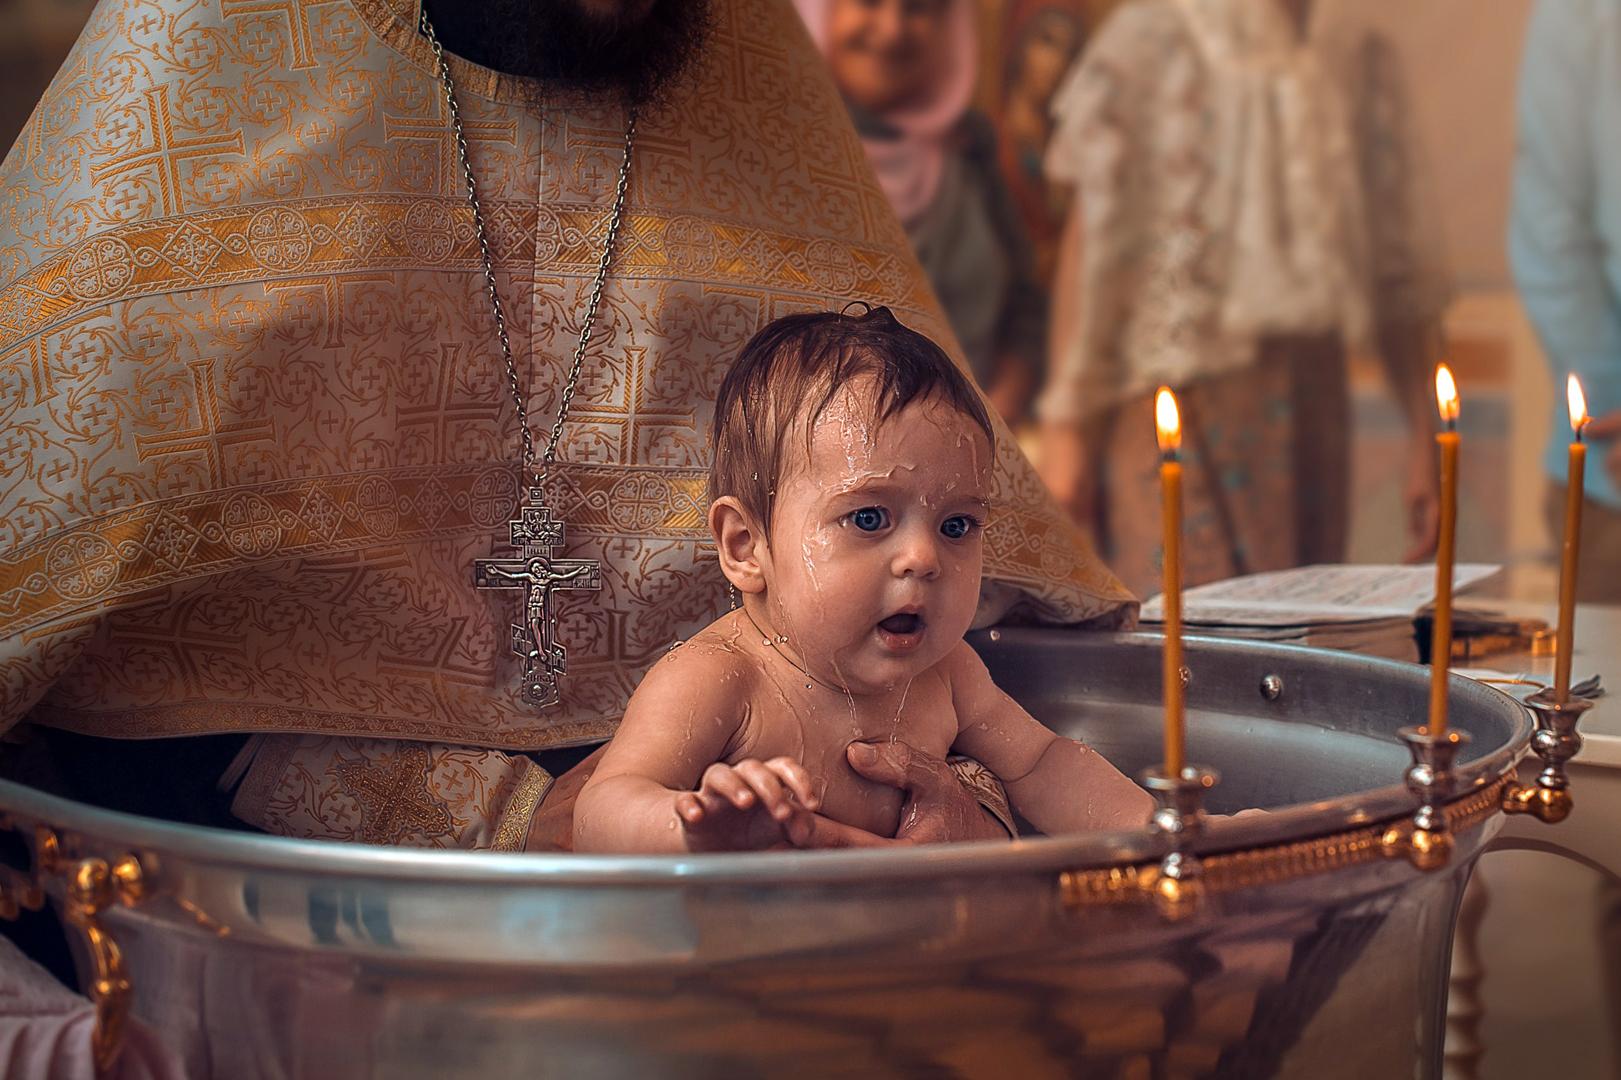 kreshhenie - Крещение